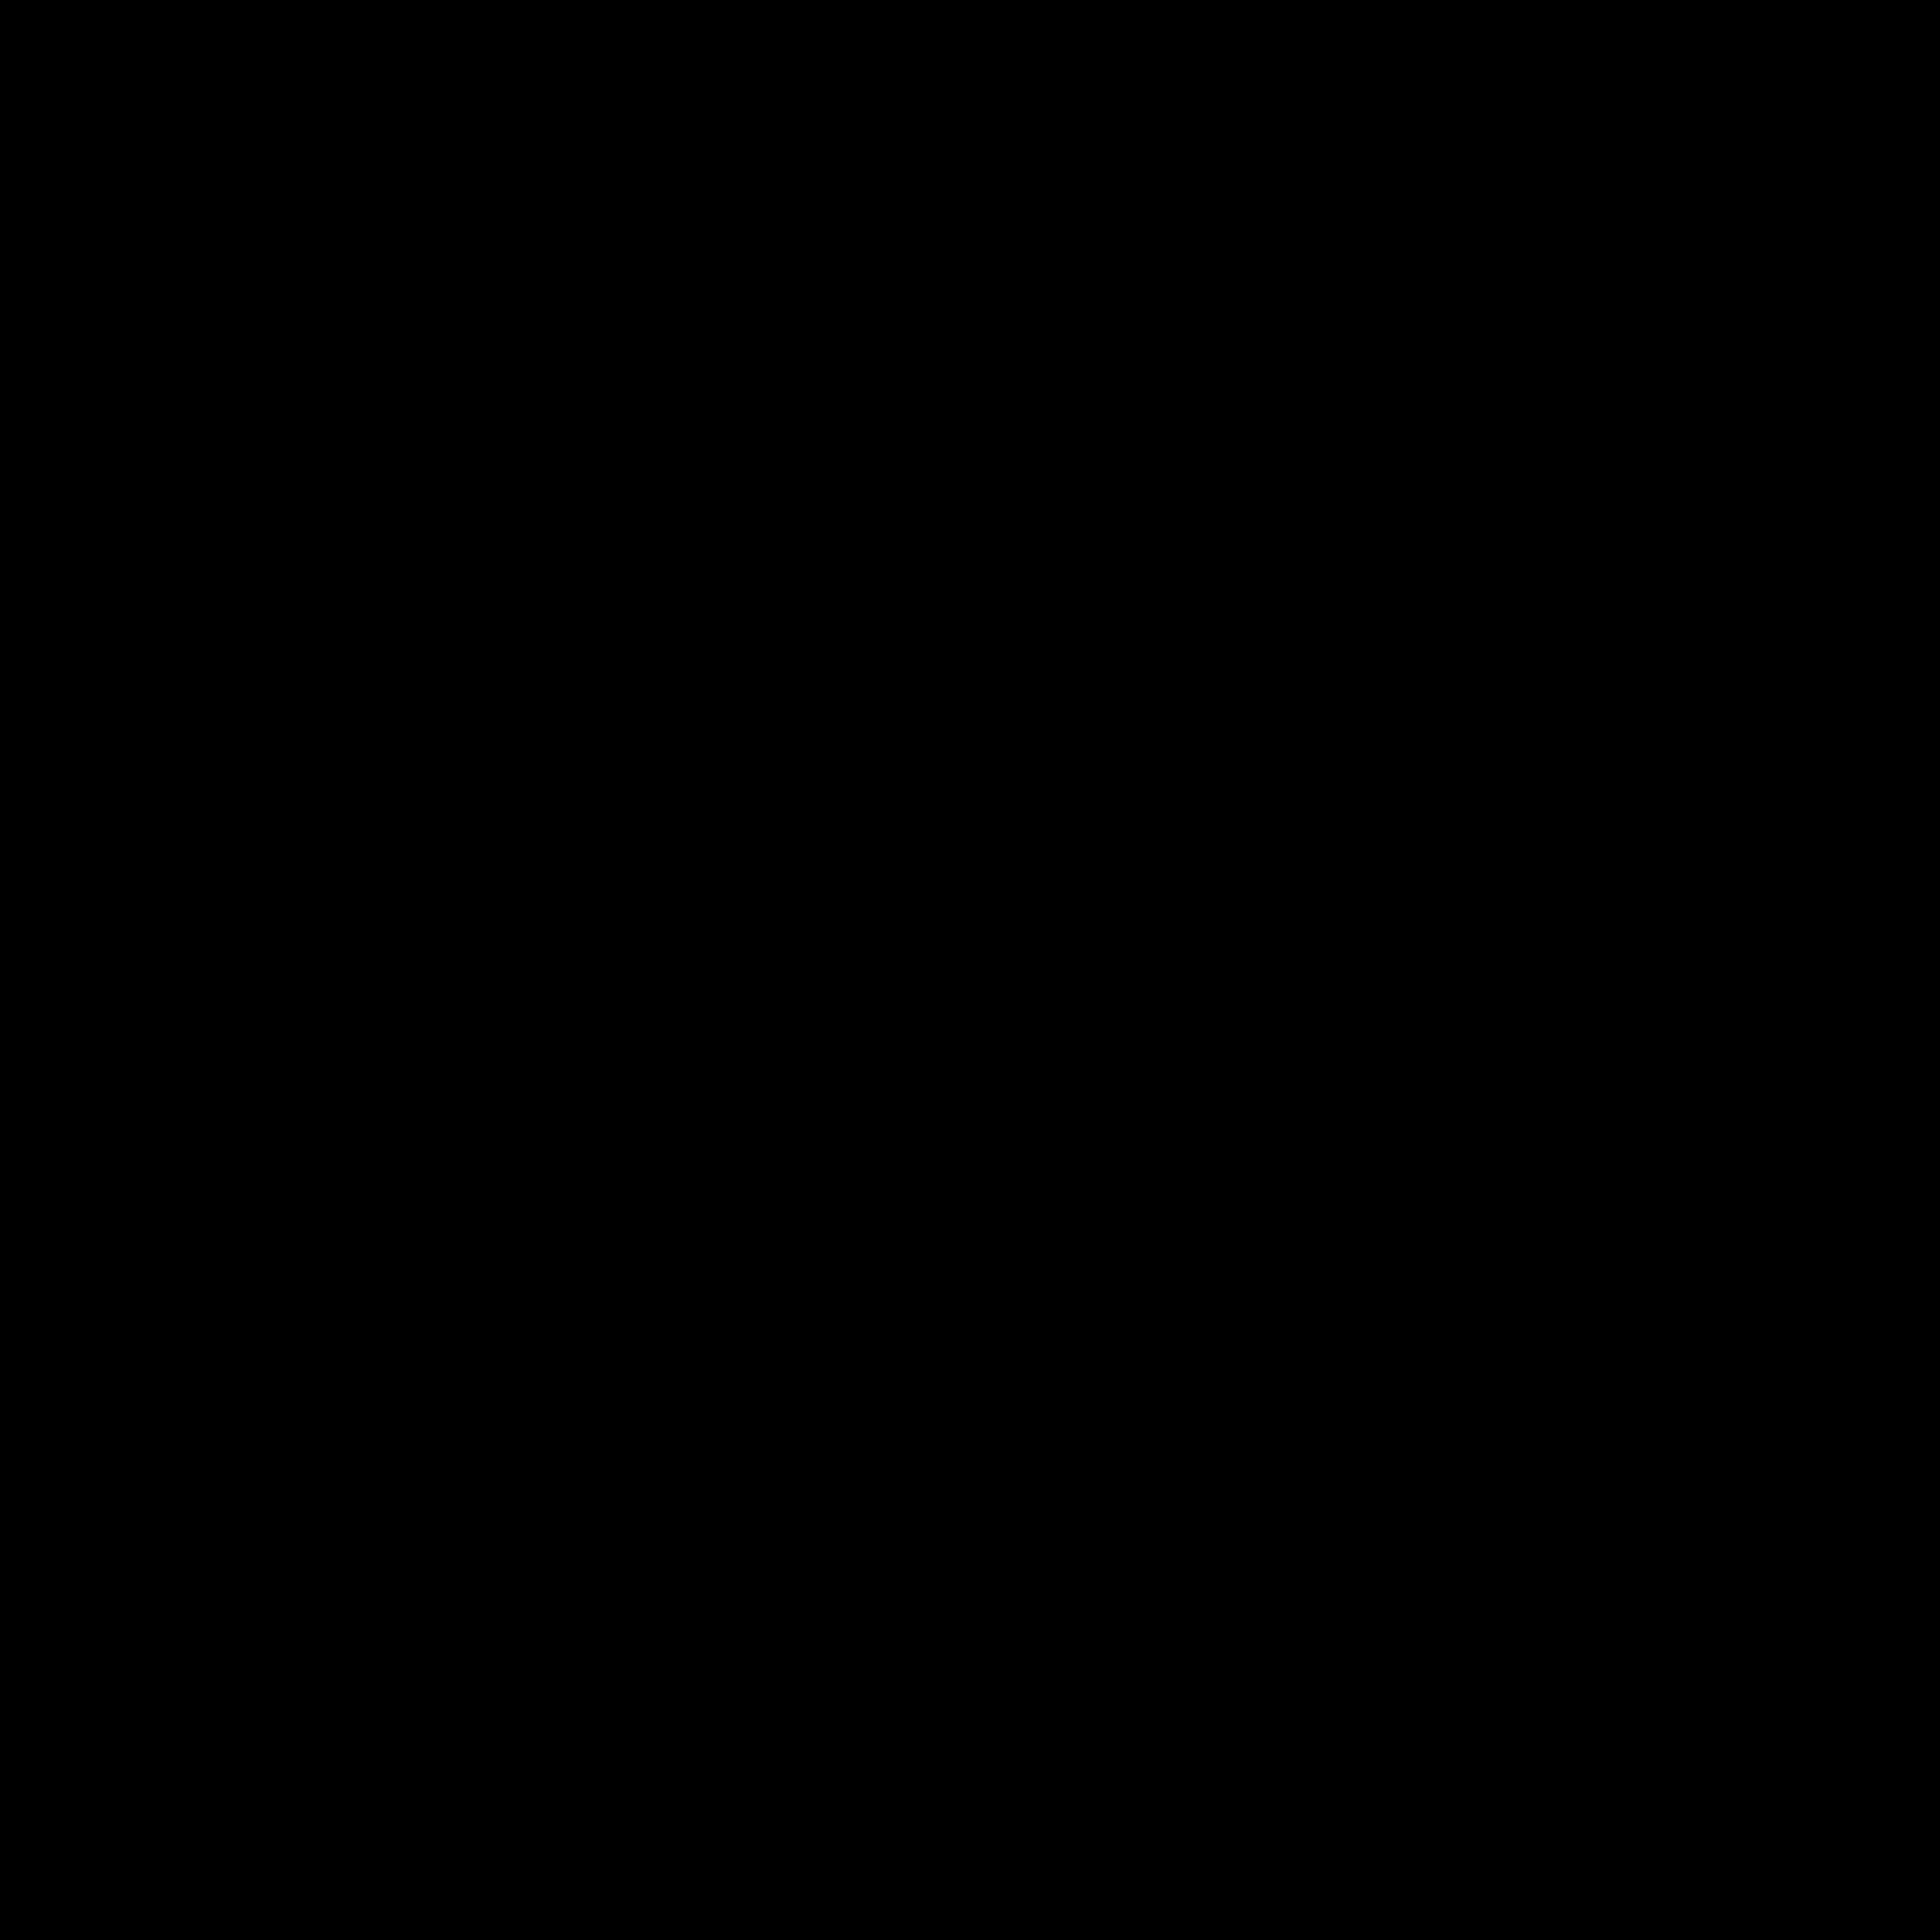 Atari Logo Png Transparent Atari Atari Logo Logos